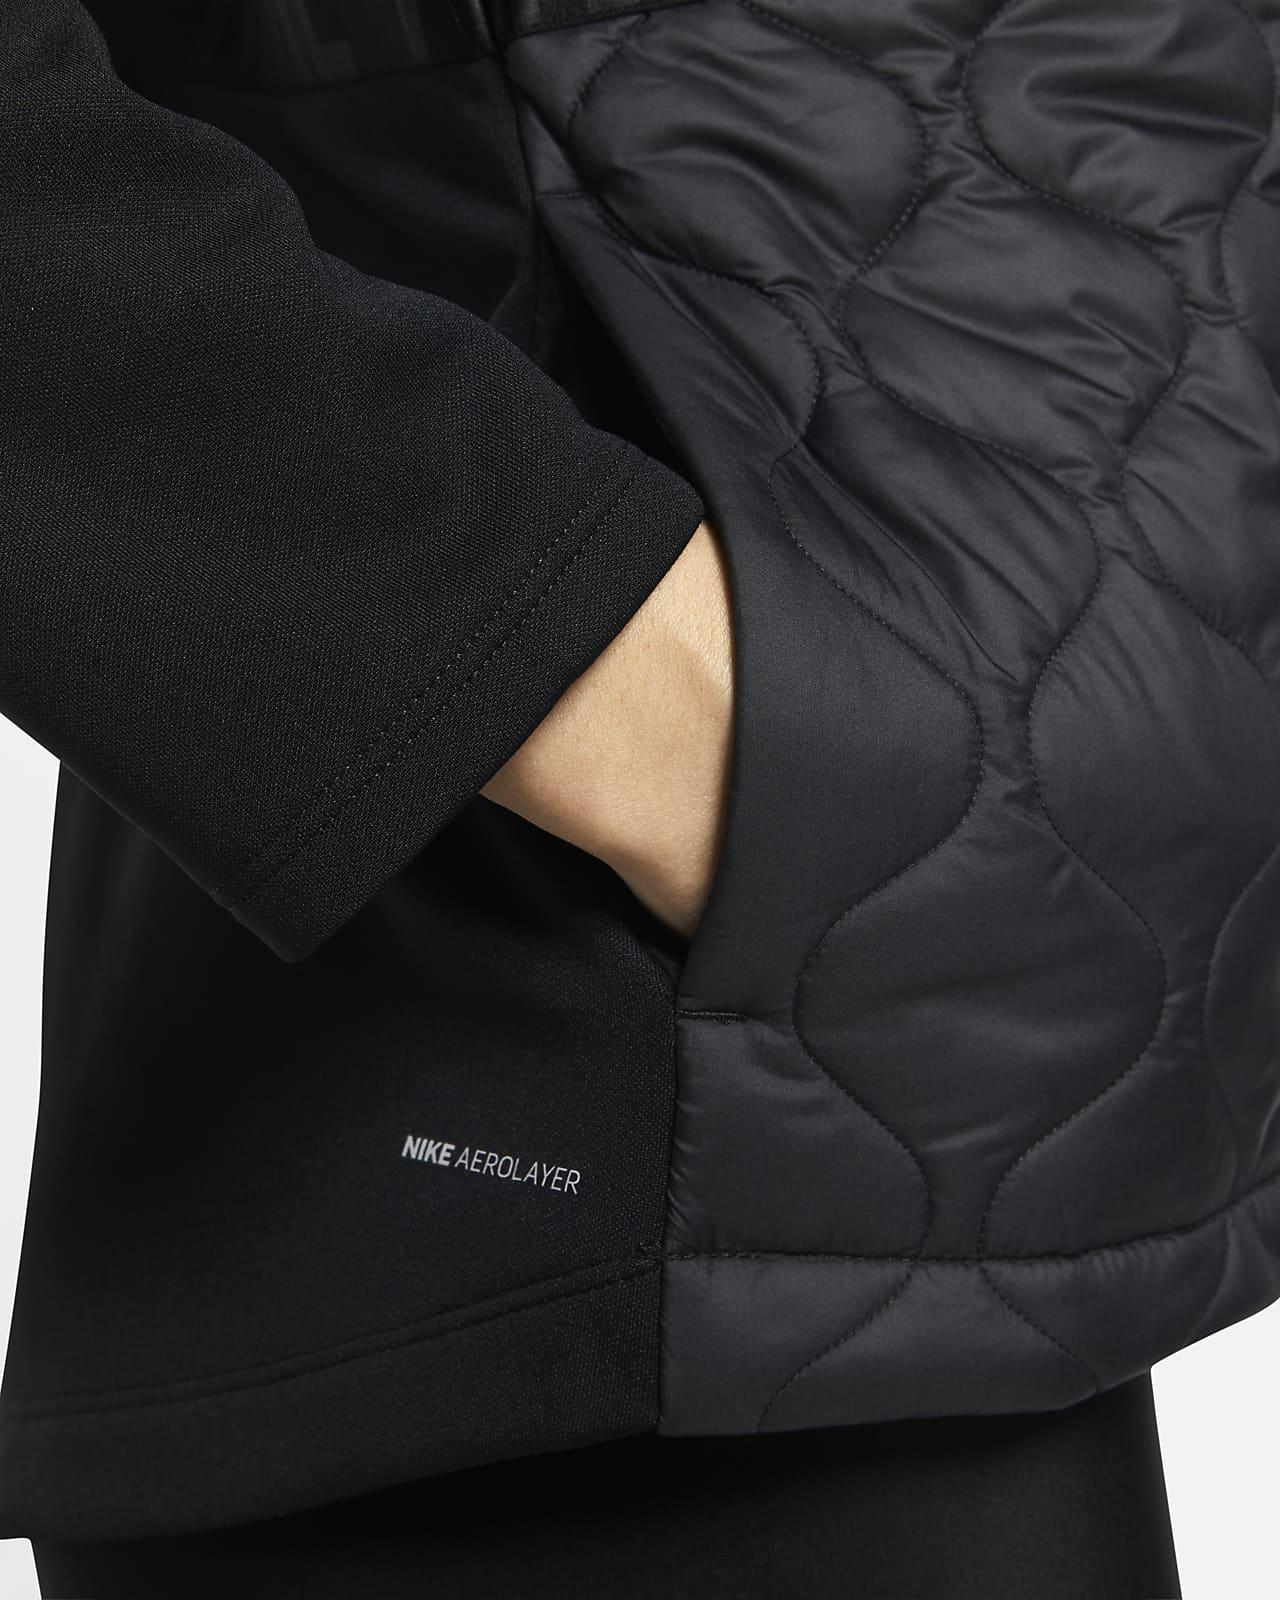 Running Jacket. Nike BG